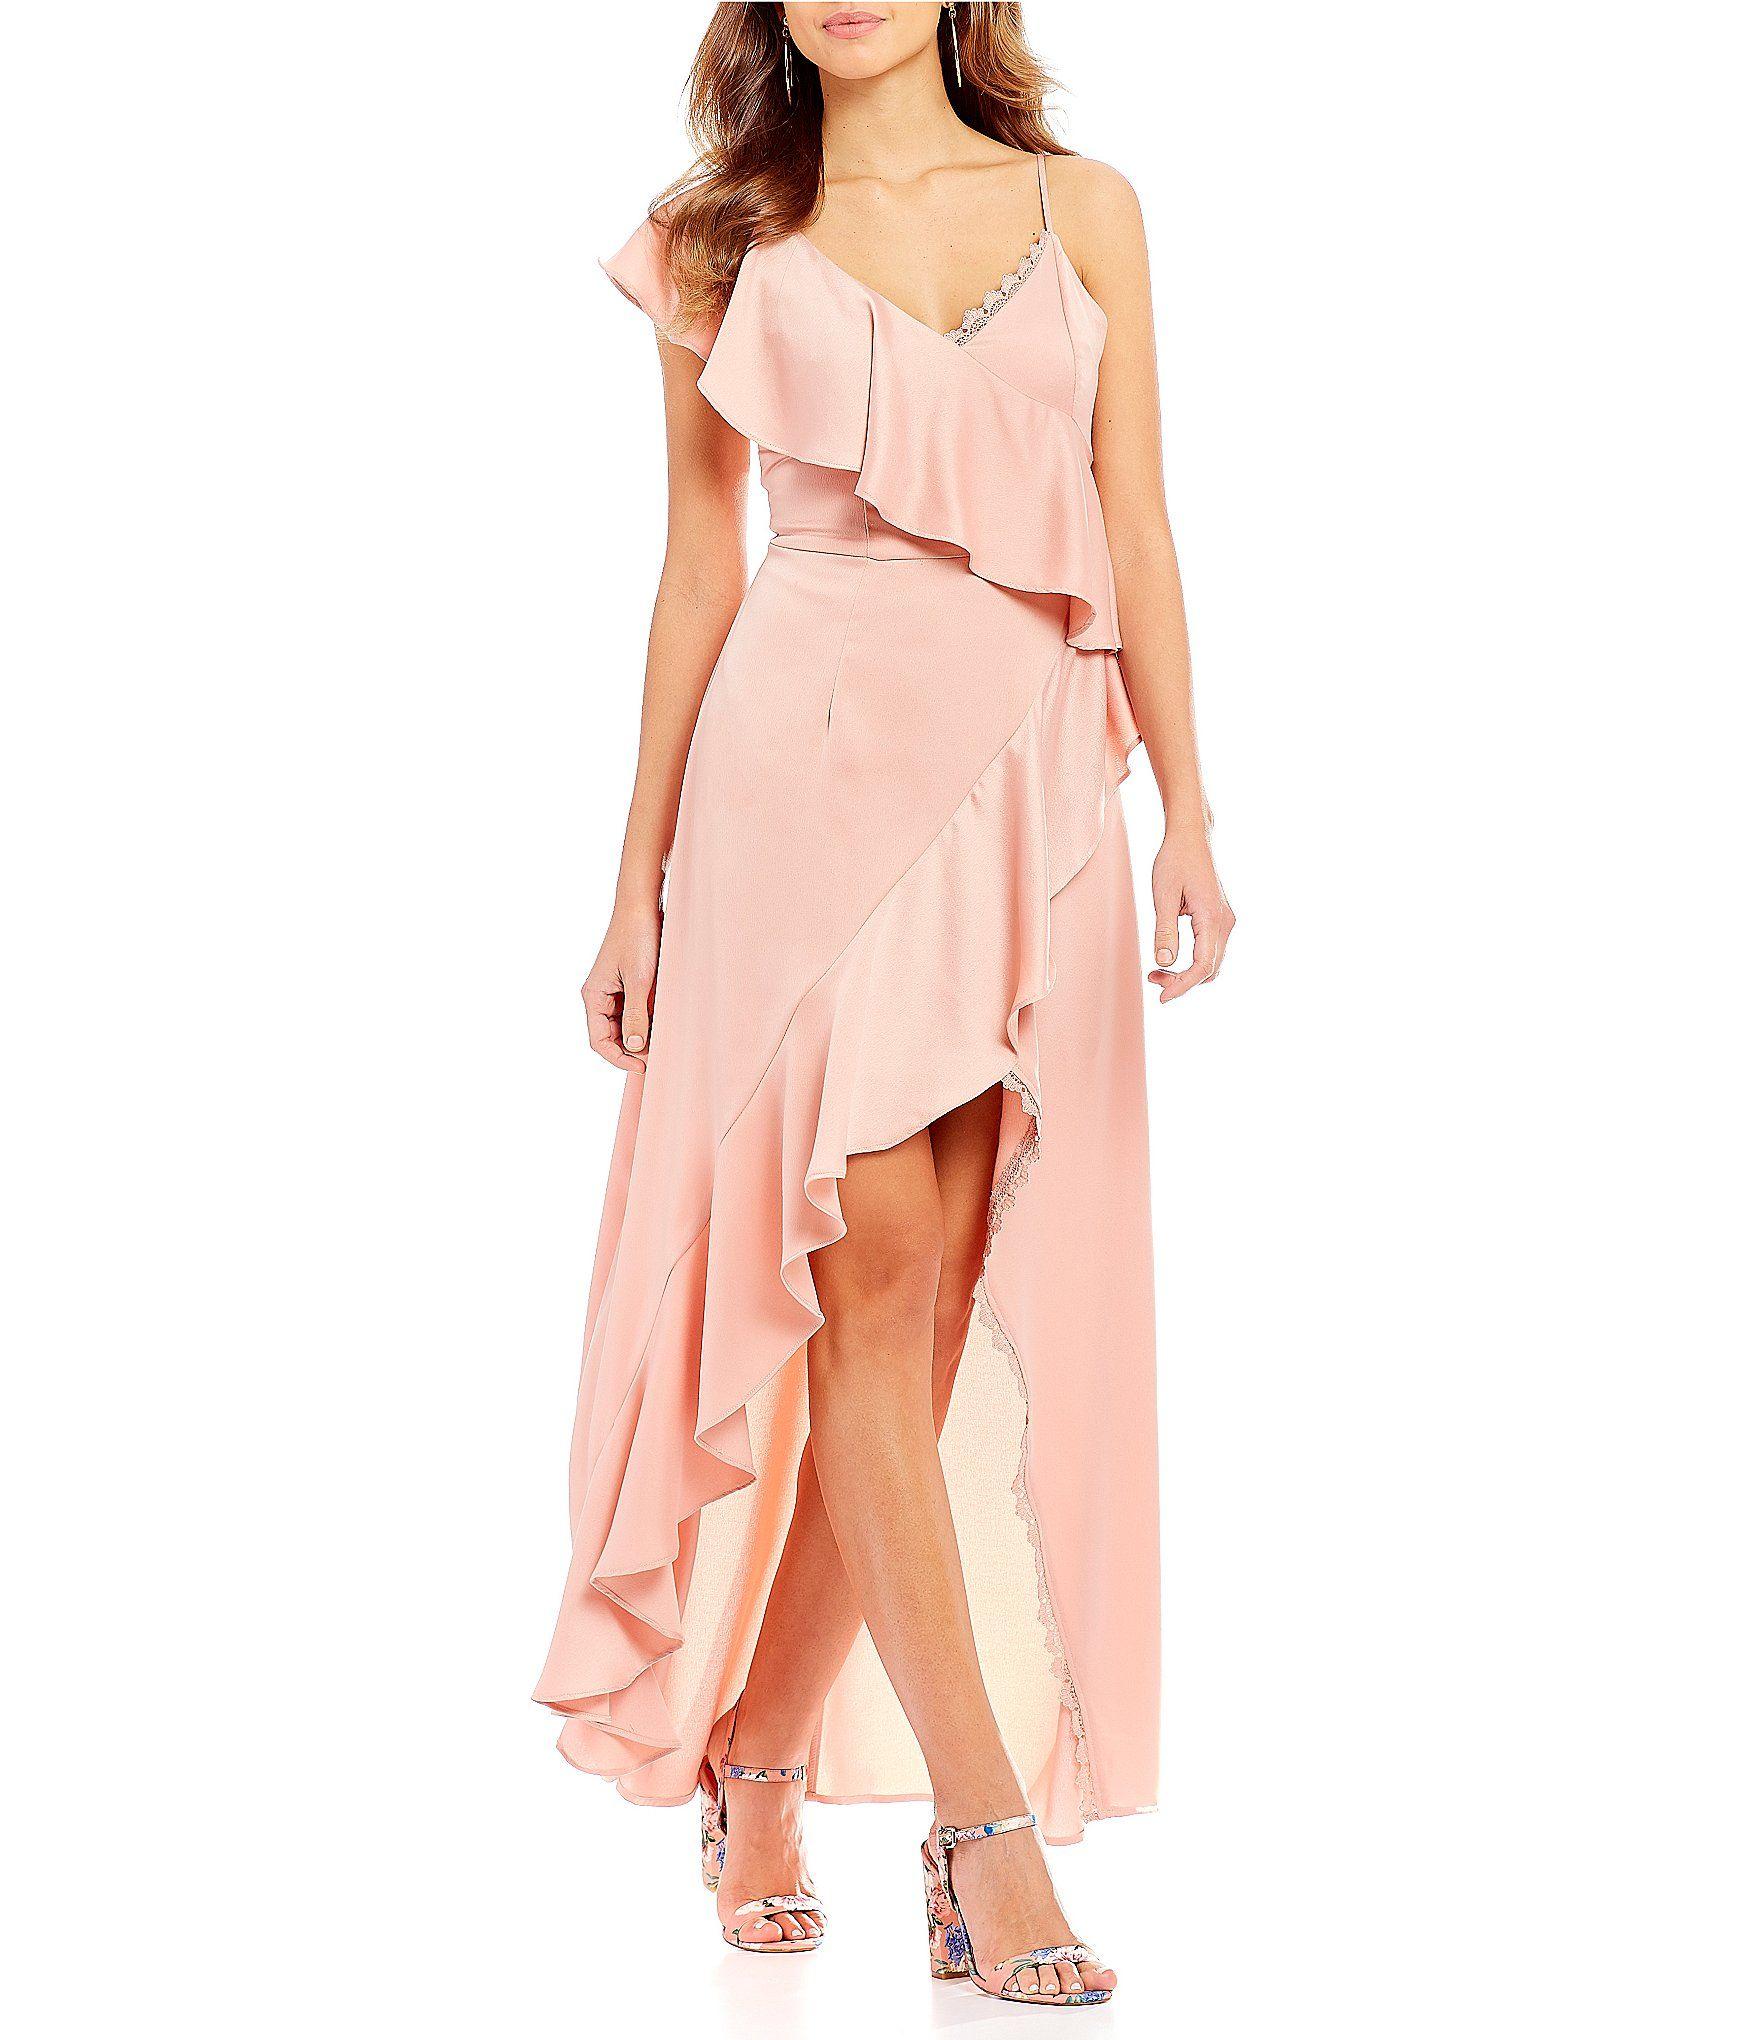 44f748609f3 Shop for Gianni Bini Rose Asymmetrical Ruffle Front Satin Faux Wrap Dress at  Dillards.com